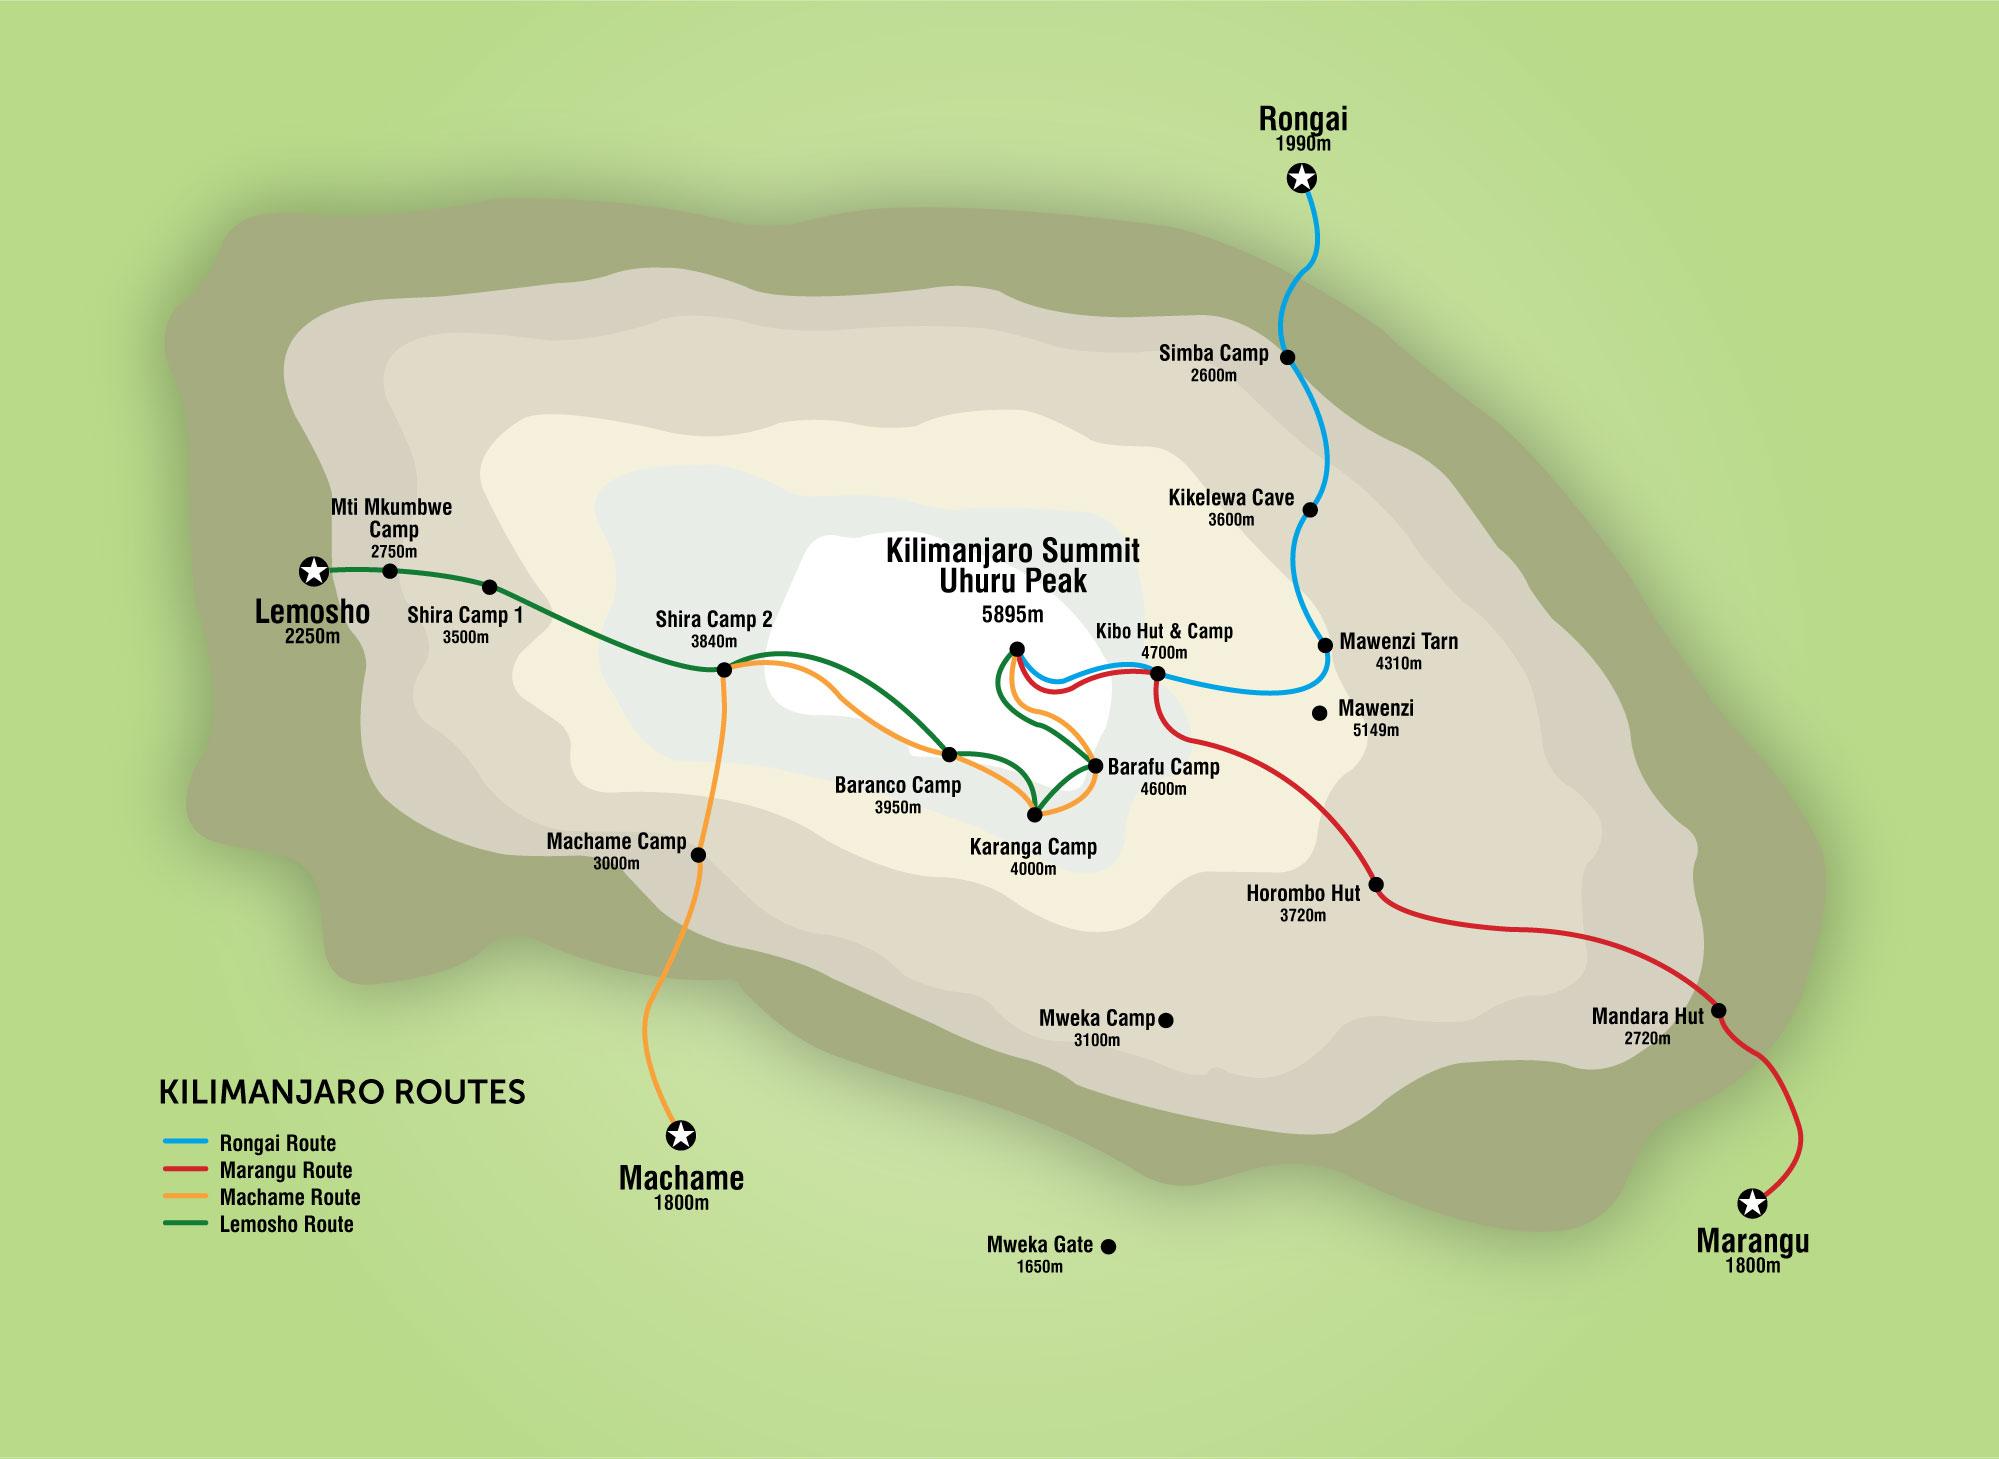 Kilimanjaro Hiking Tours - G Adventures